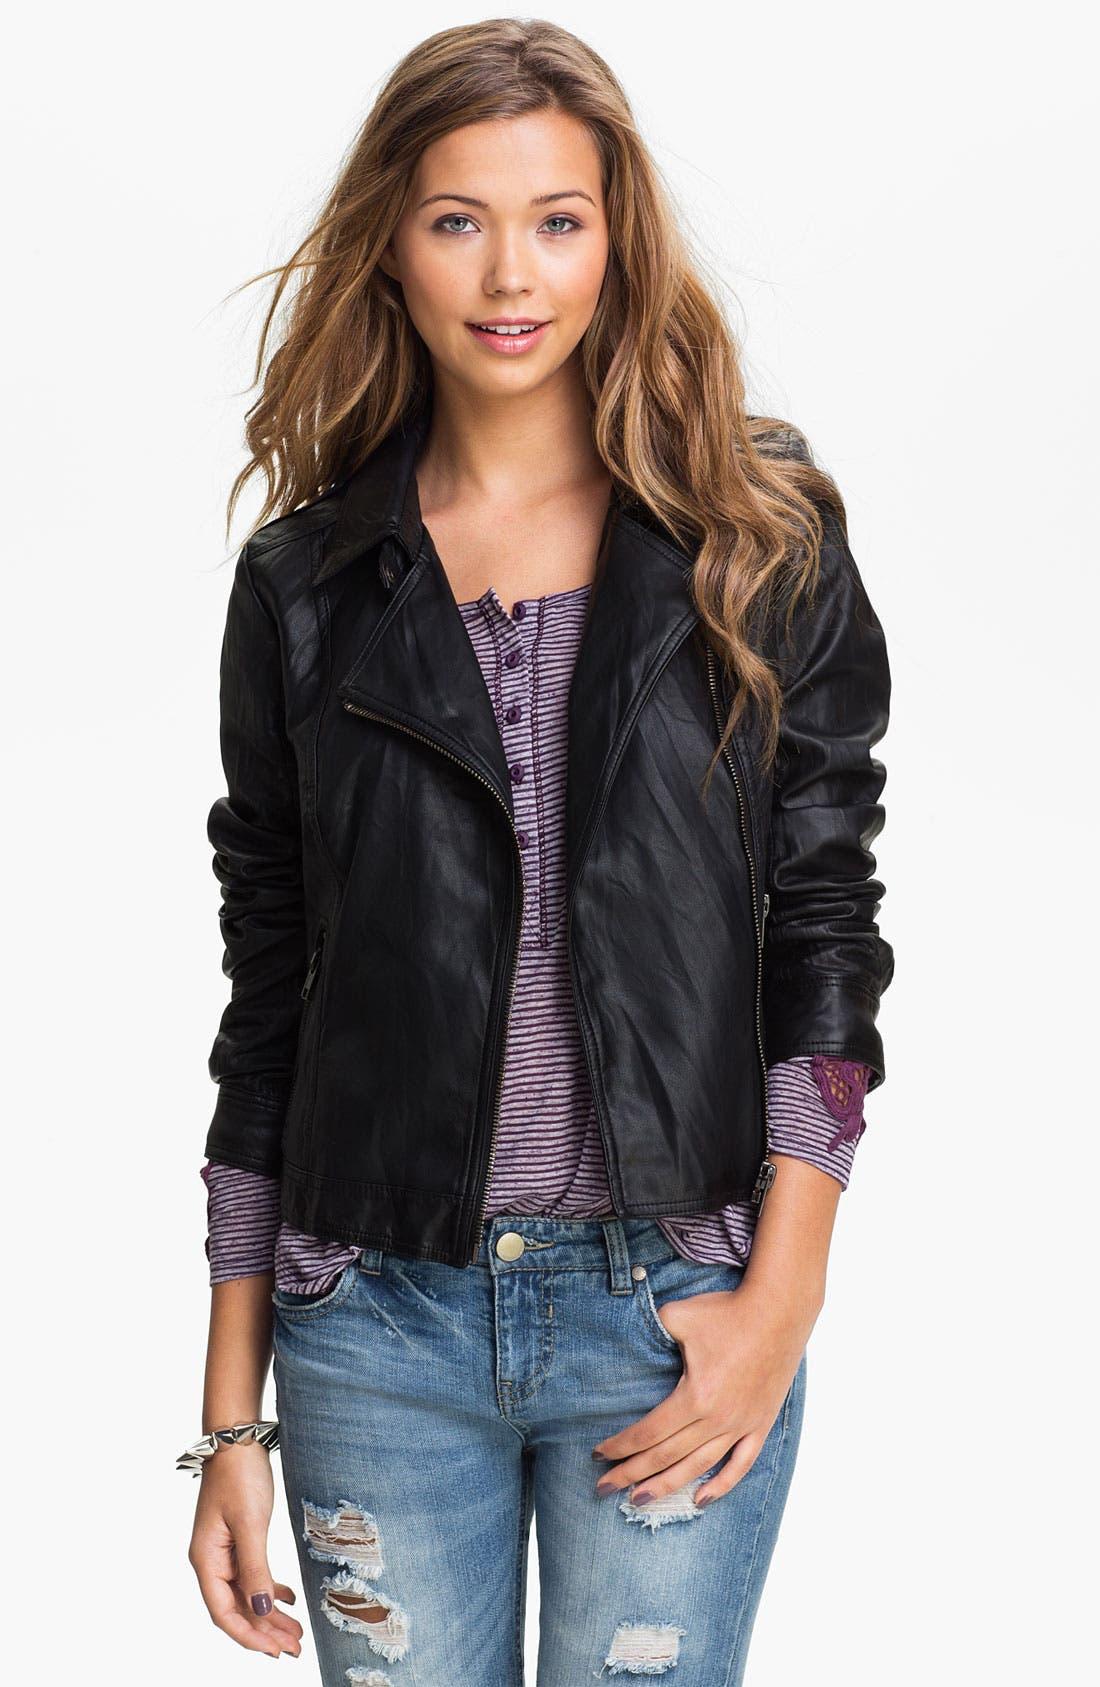 Alternate Image 1 Selected - Lost Faux Leather Biker Jacket (Juniors)